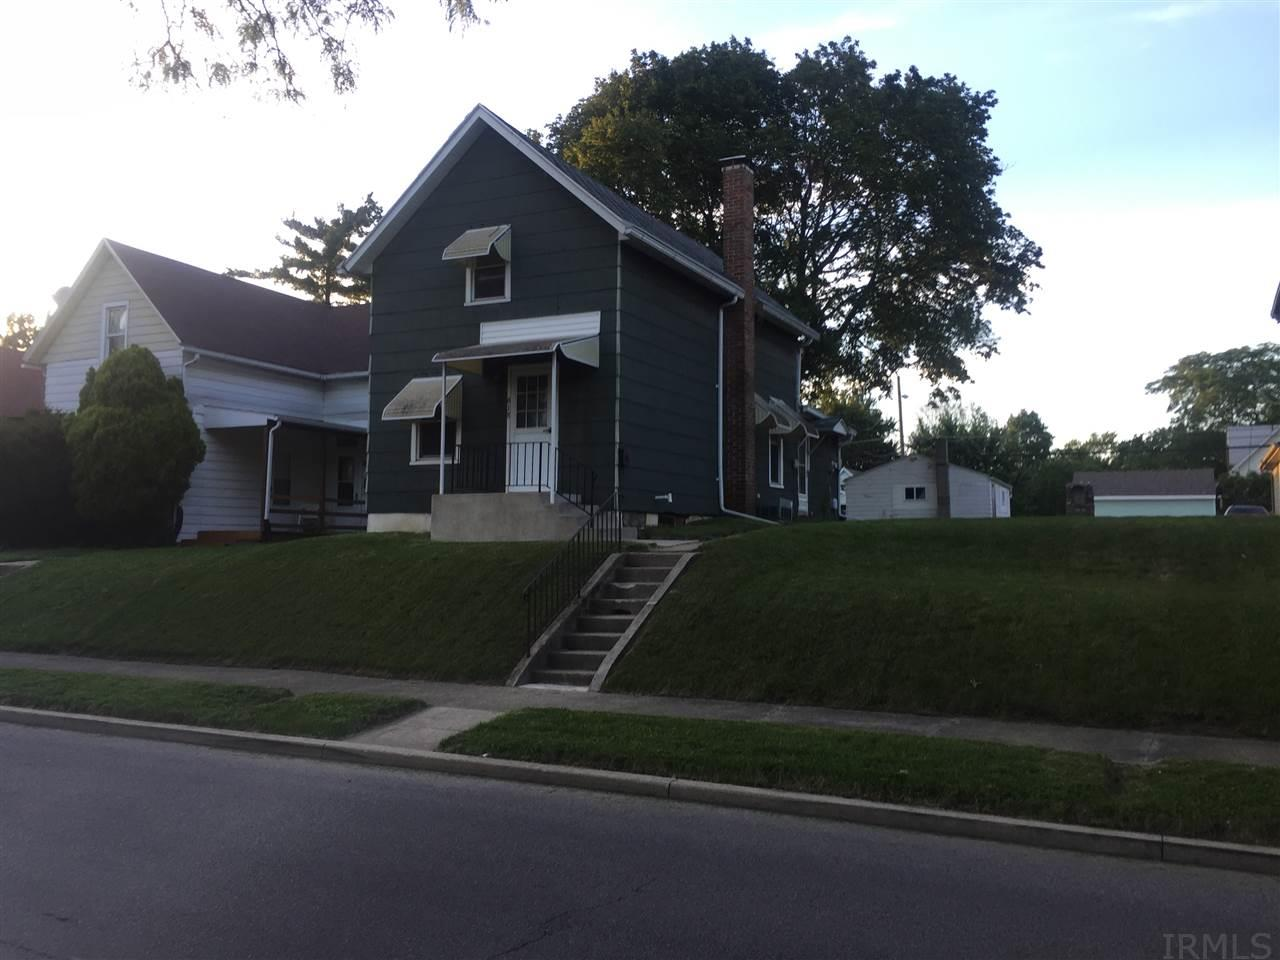 618 putnam, Fort Wayne, IN 46808